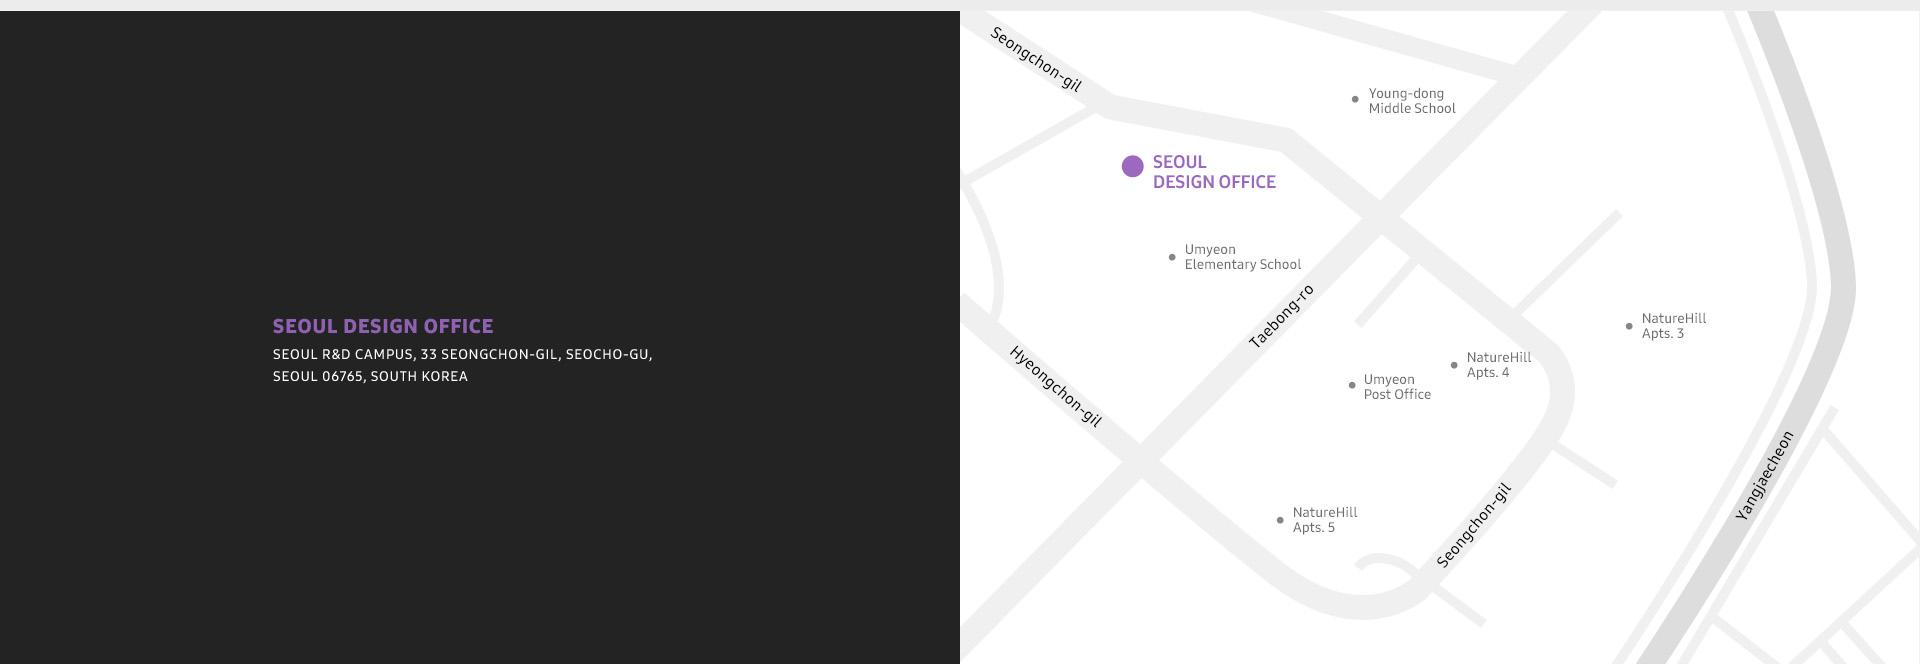 [Map]  SEOUL DESIGN OFFICE  SEOUL R&D CAMPUS, 33 SEONGCHON-GIL, SEOCHO-GU, SEOUL 06765, SOUTH KOREA